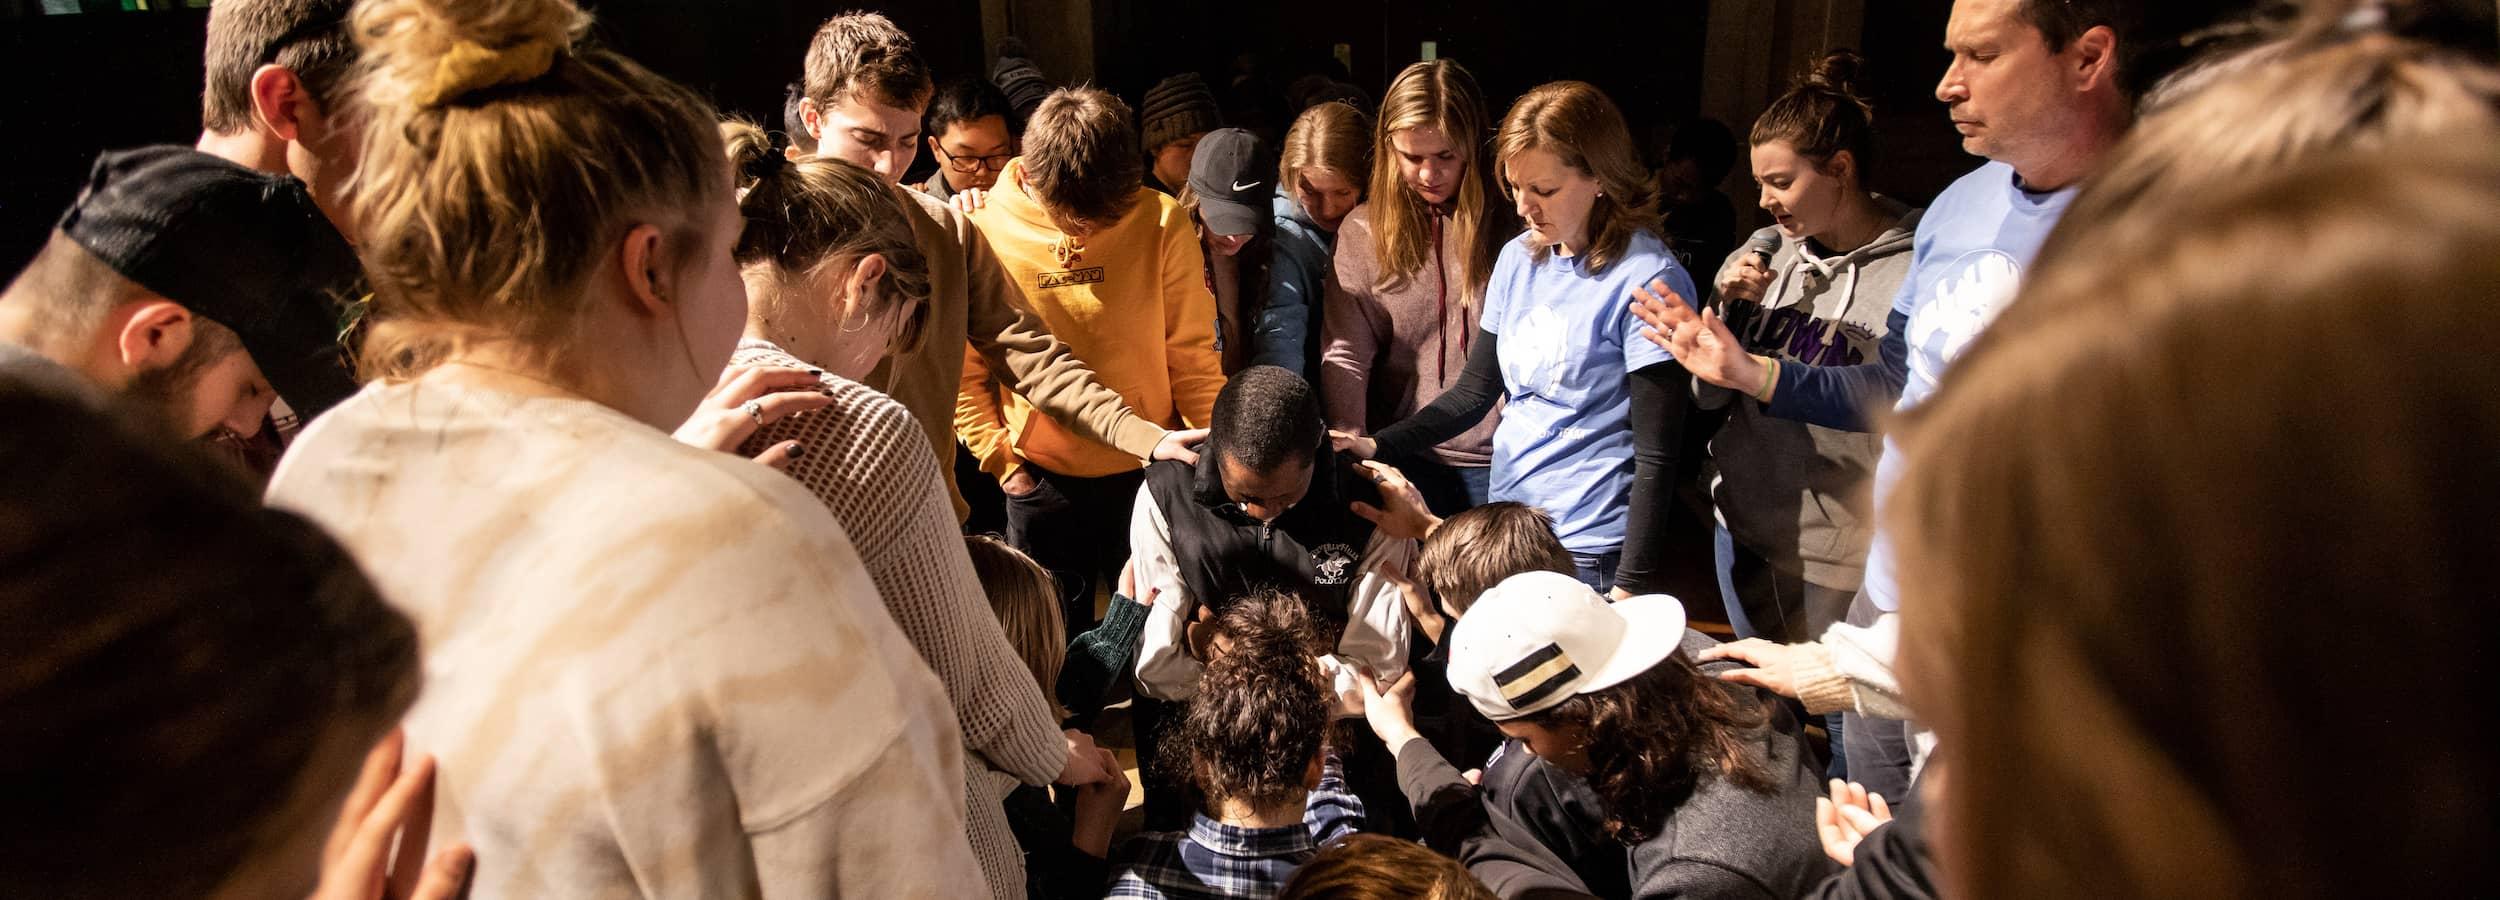 Jacque Prayer